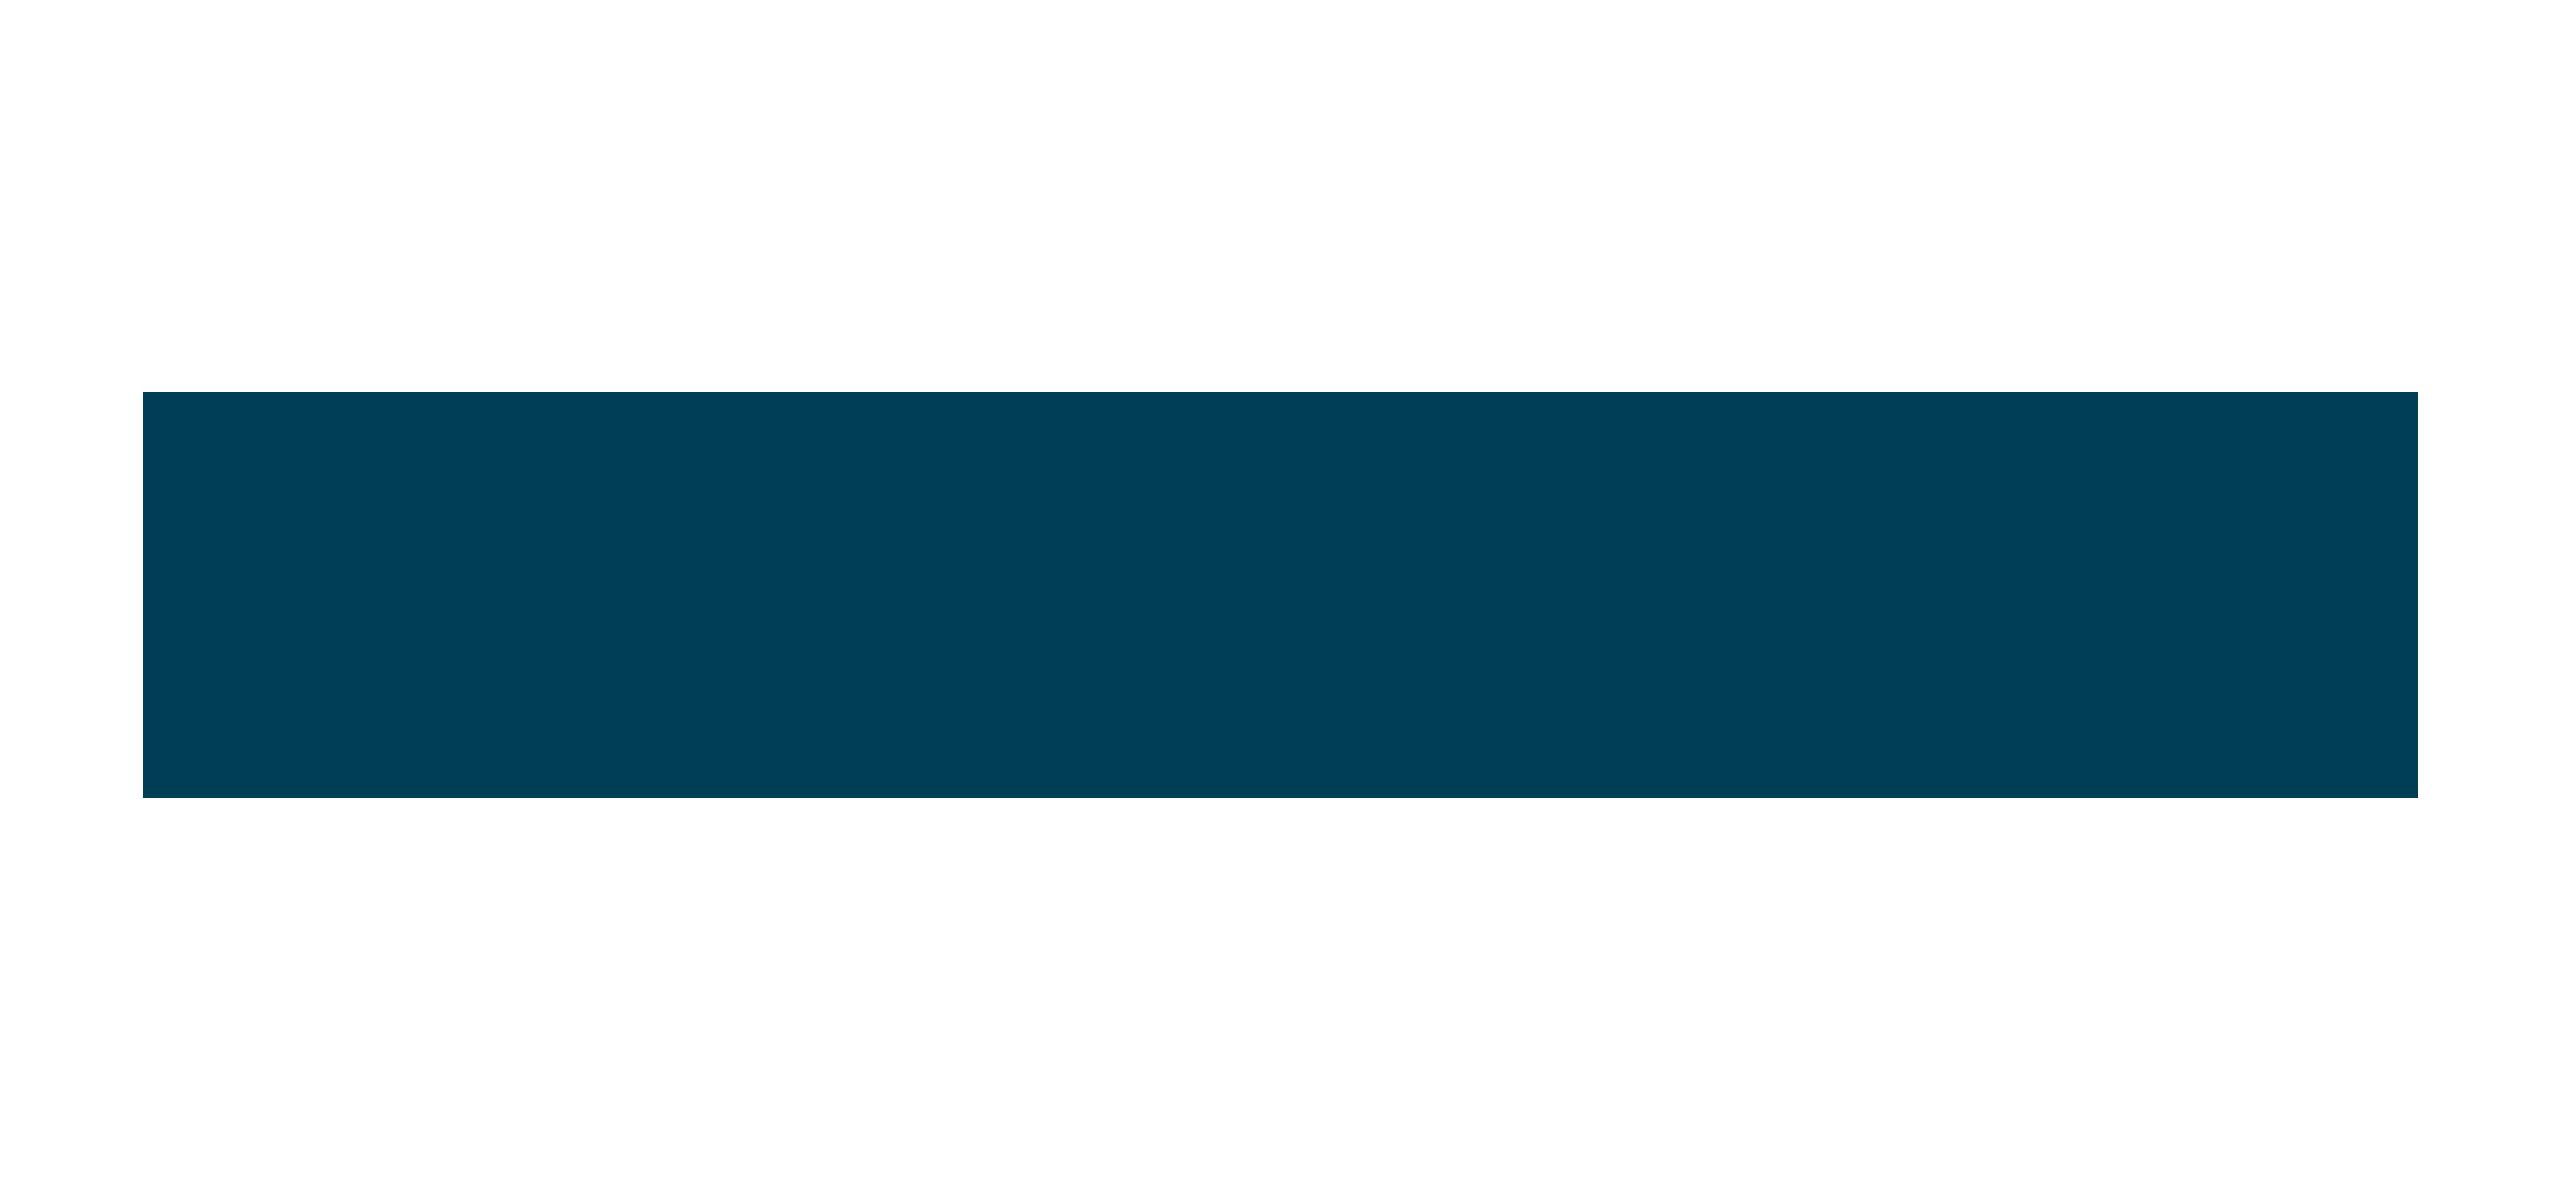 LOGO LEYNOR NUEVO PNG SIN FONDO AZUL - Portfolio